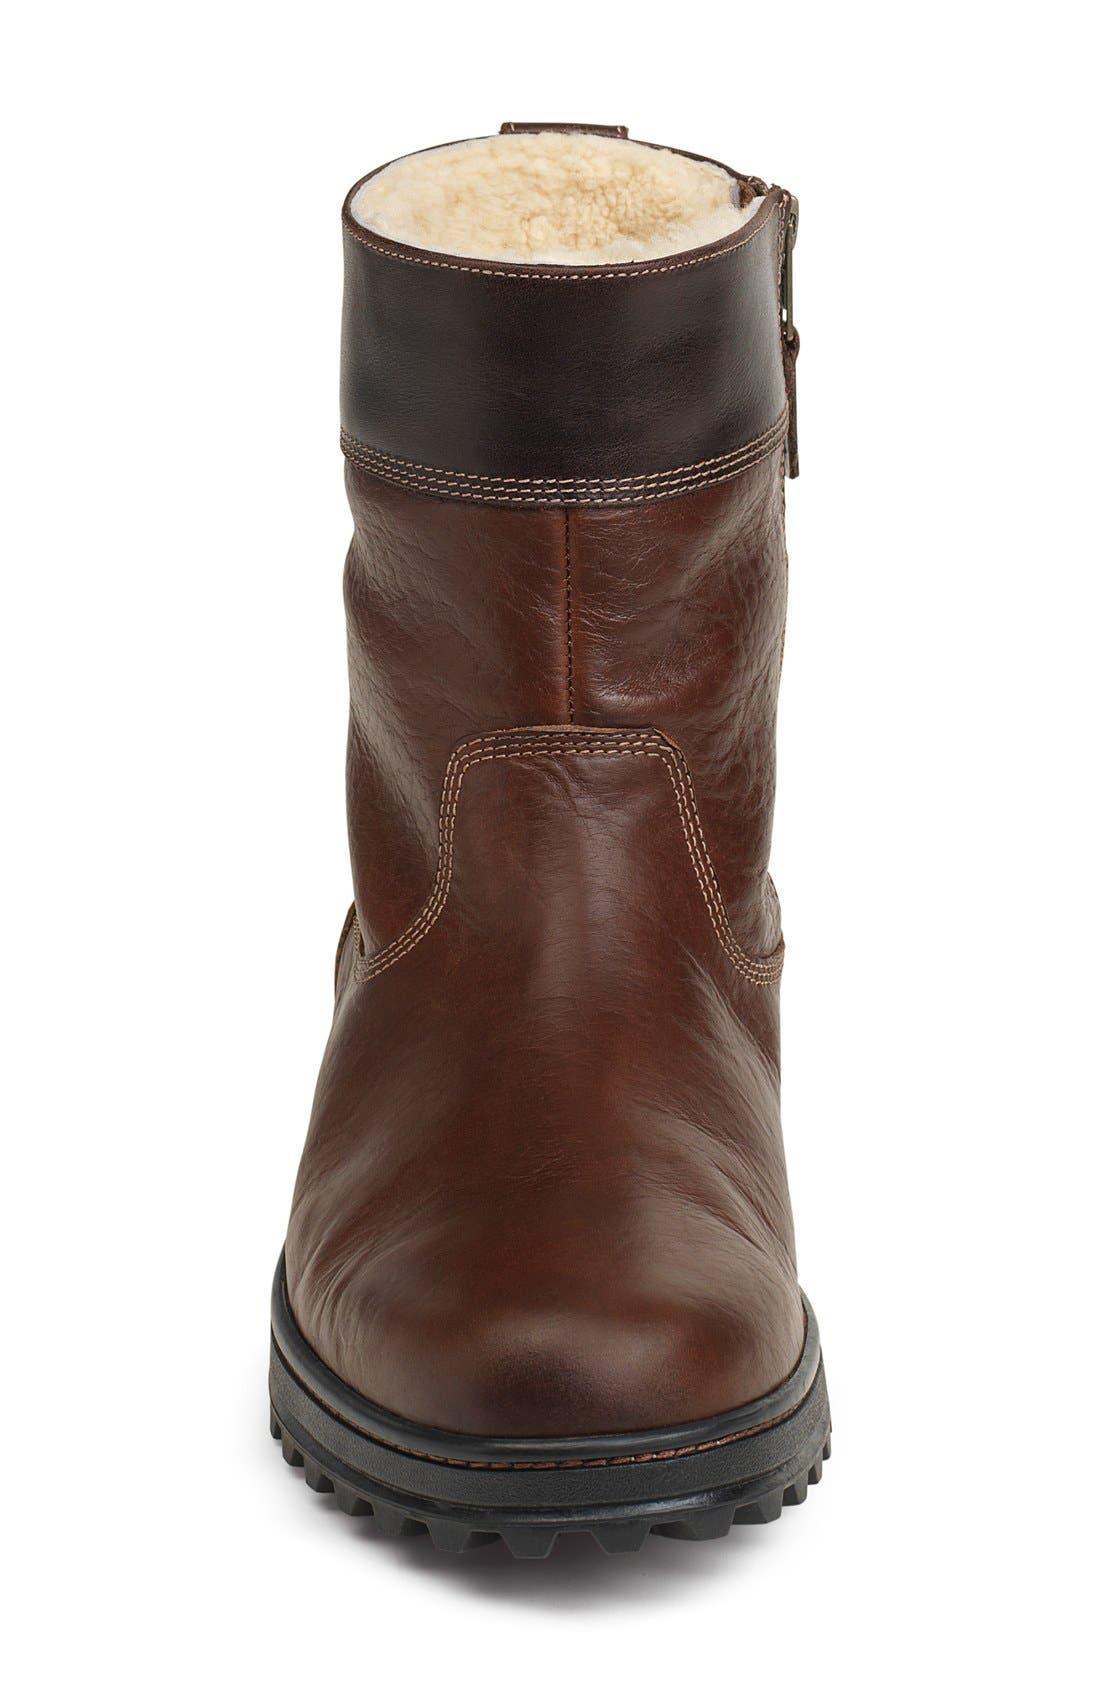 Alternate Image 3  - Trask 'Winslow' Plain Toe Boot (Men)